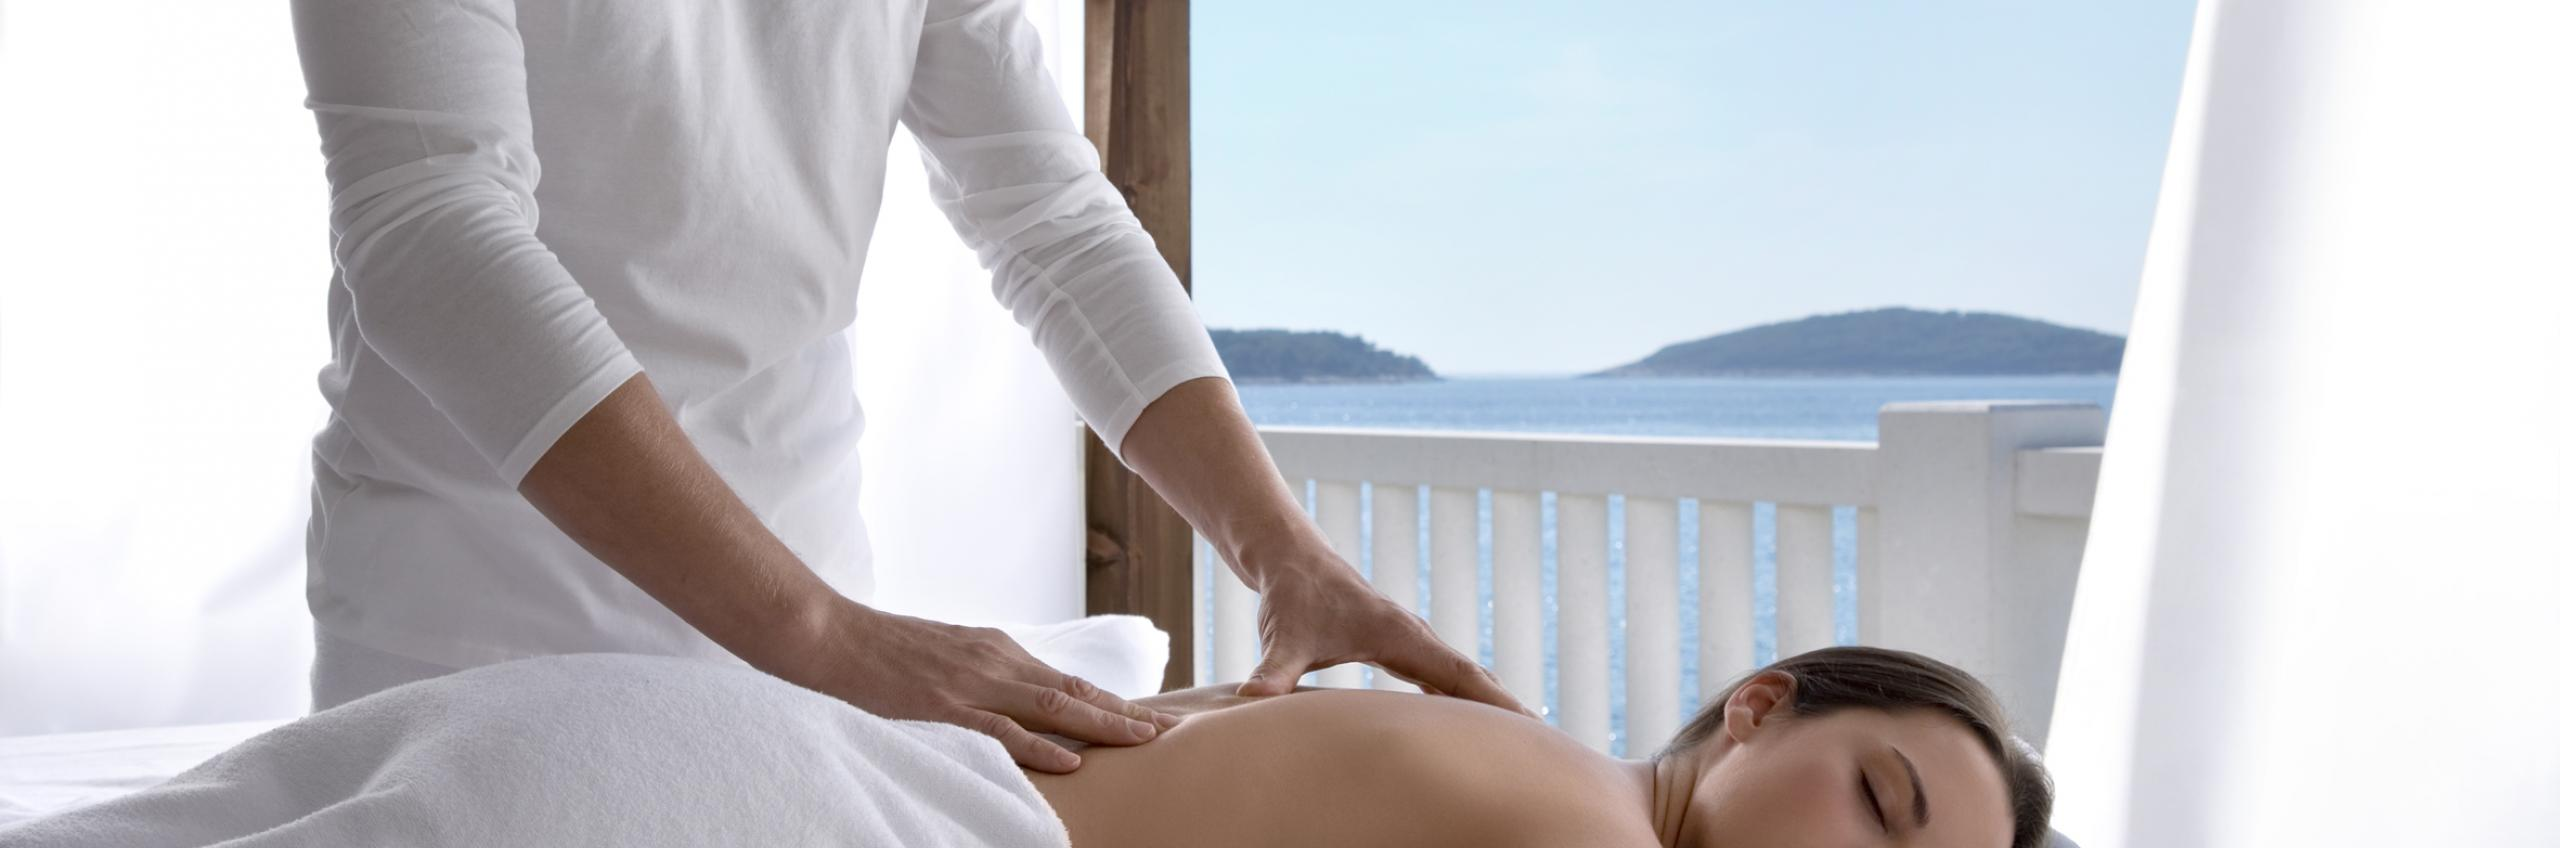 Sensori Ô at Bonj 'les bains' brings our spa to you!